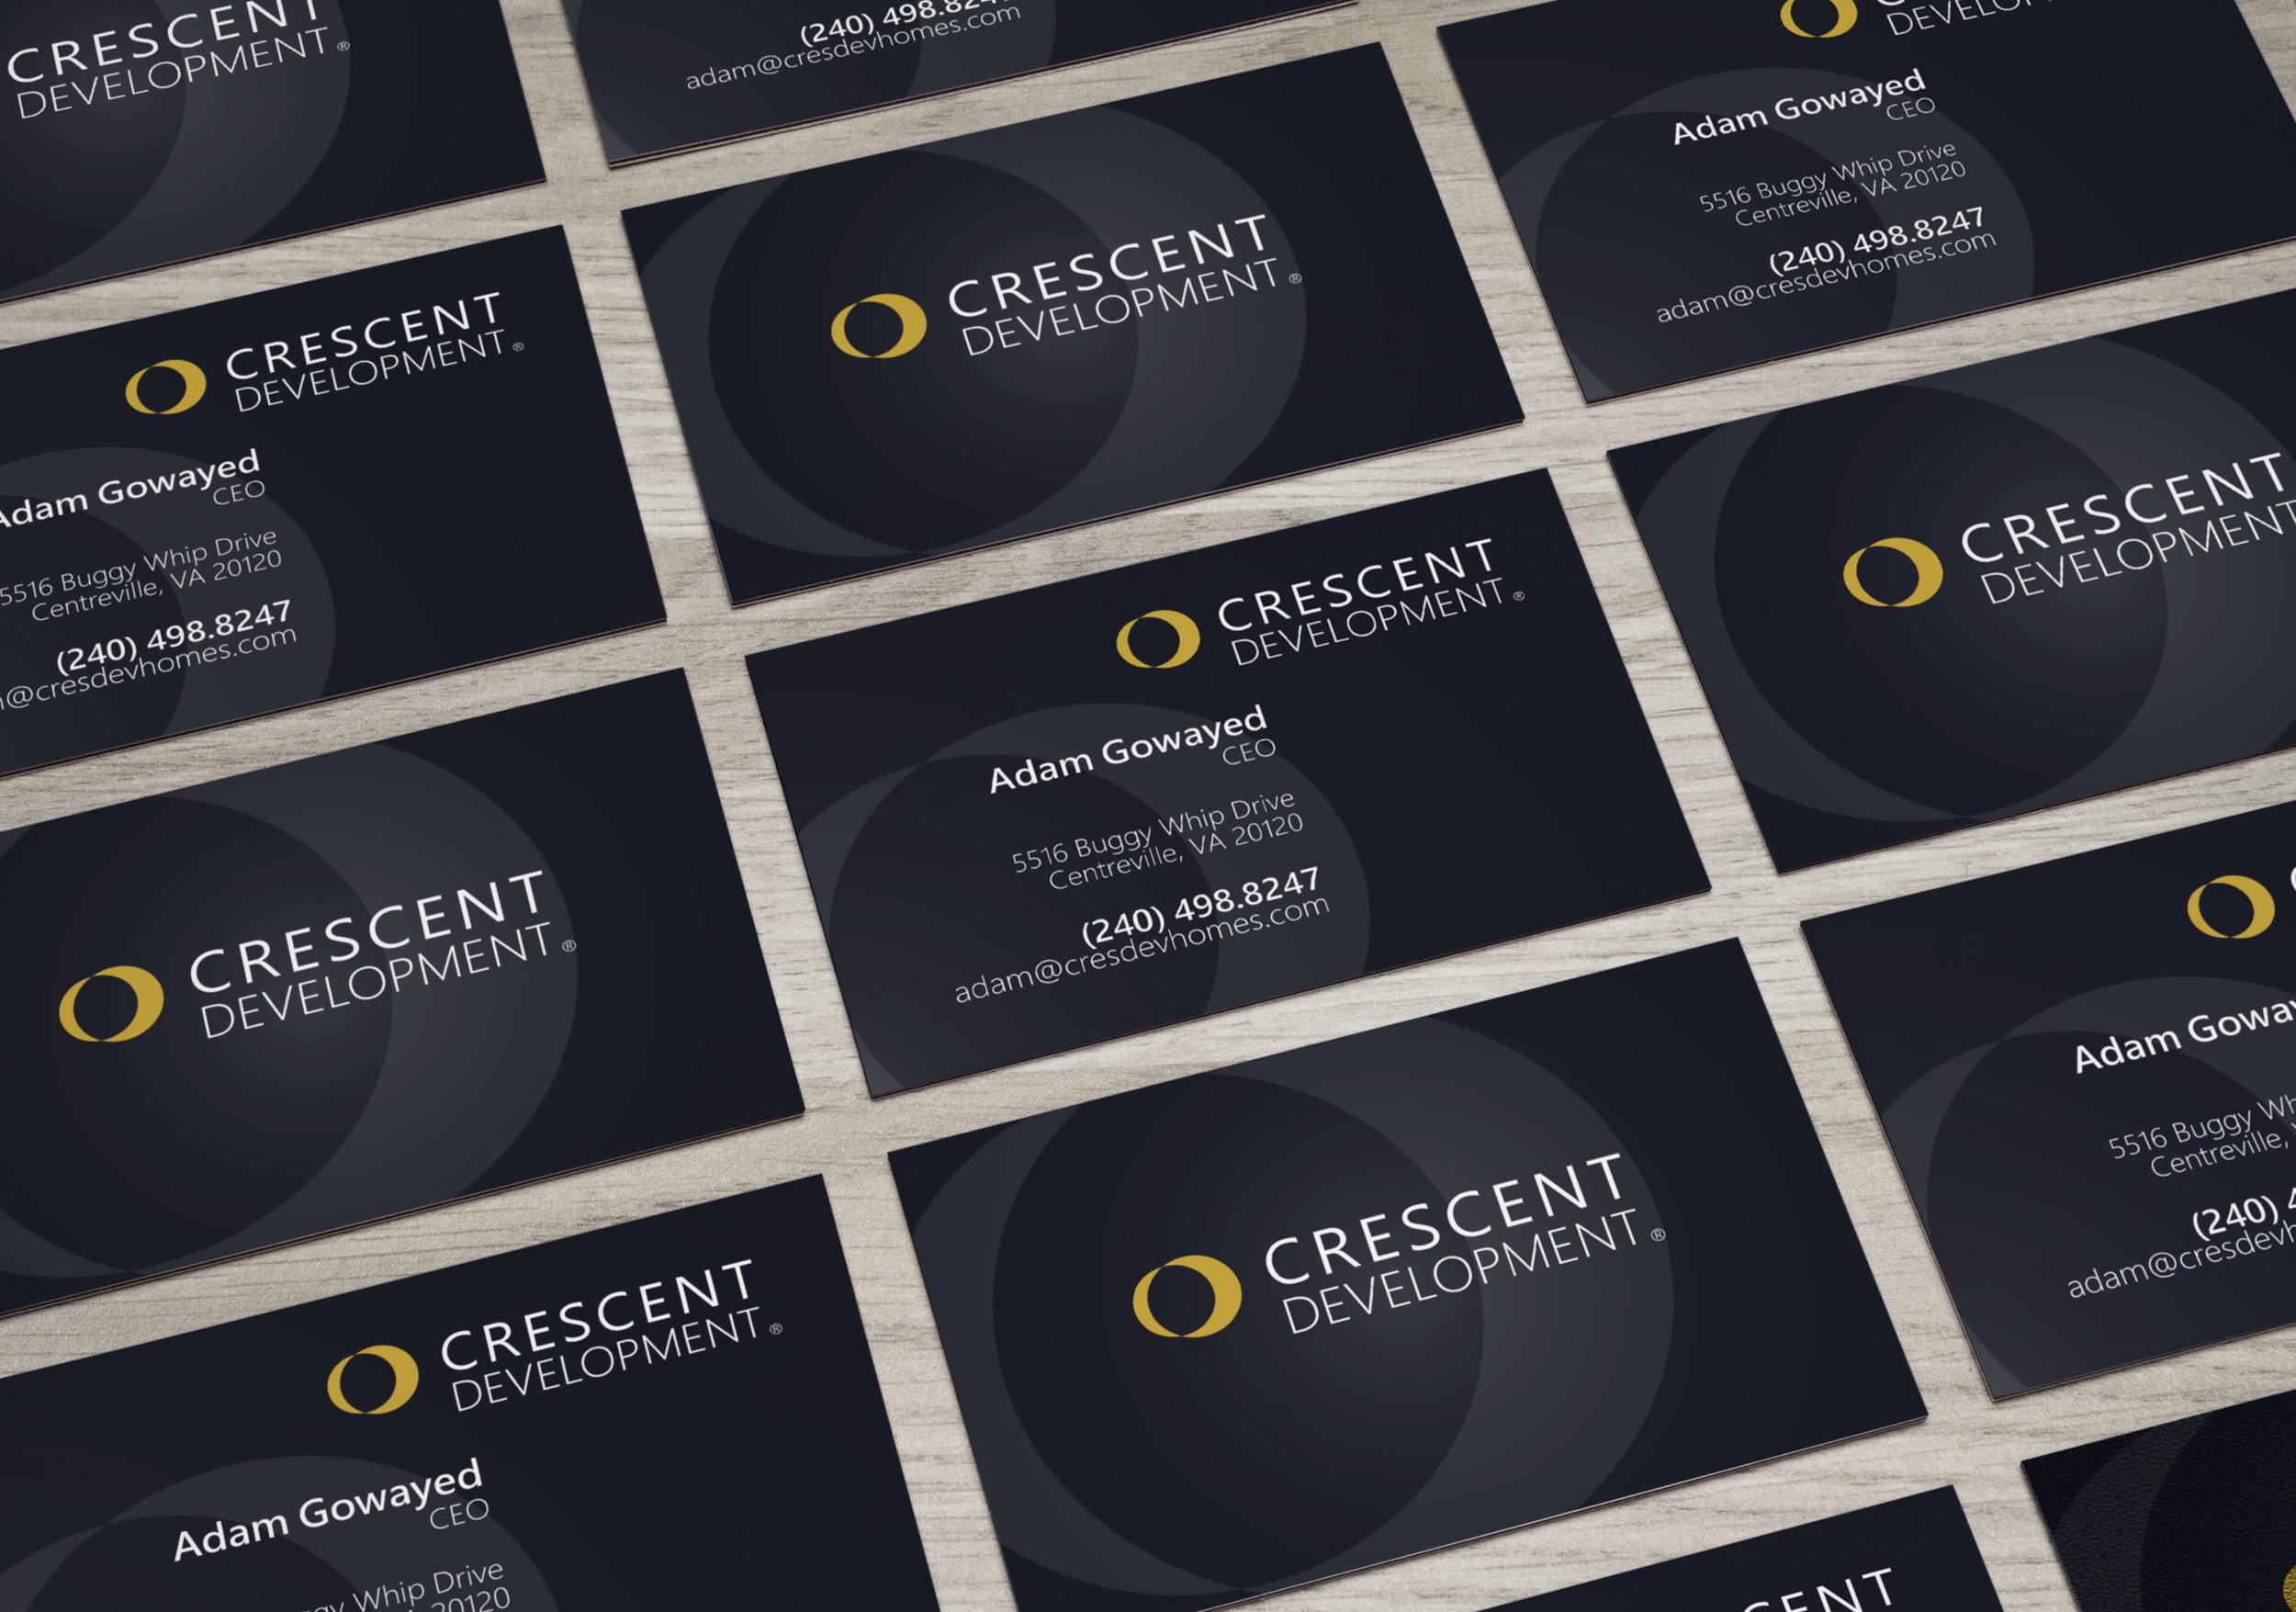 Cresent Cards.jpg